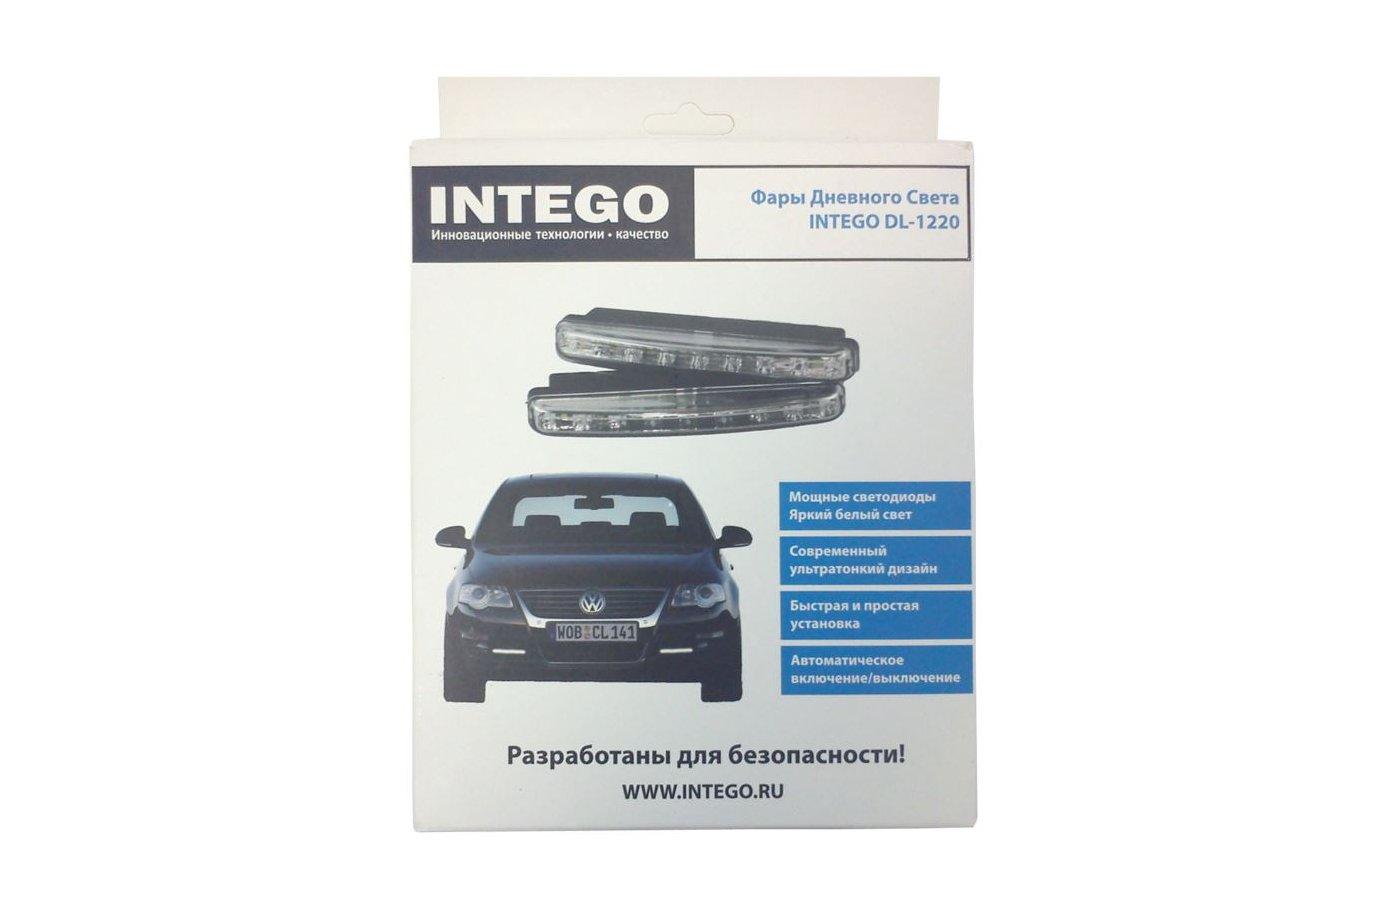 INTEGO DL-1220